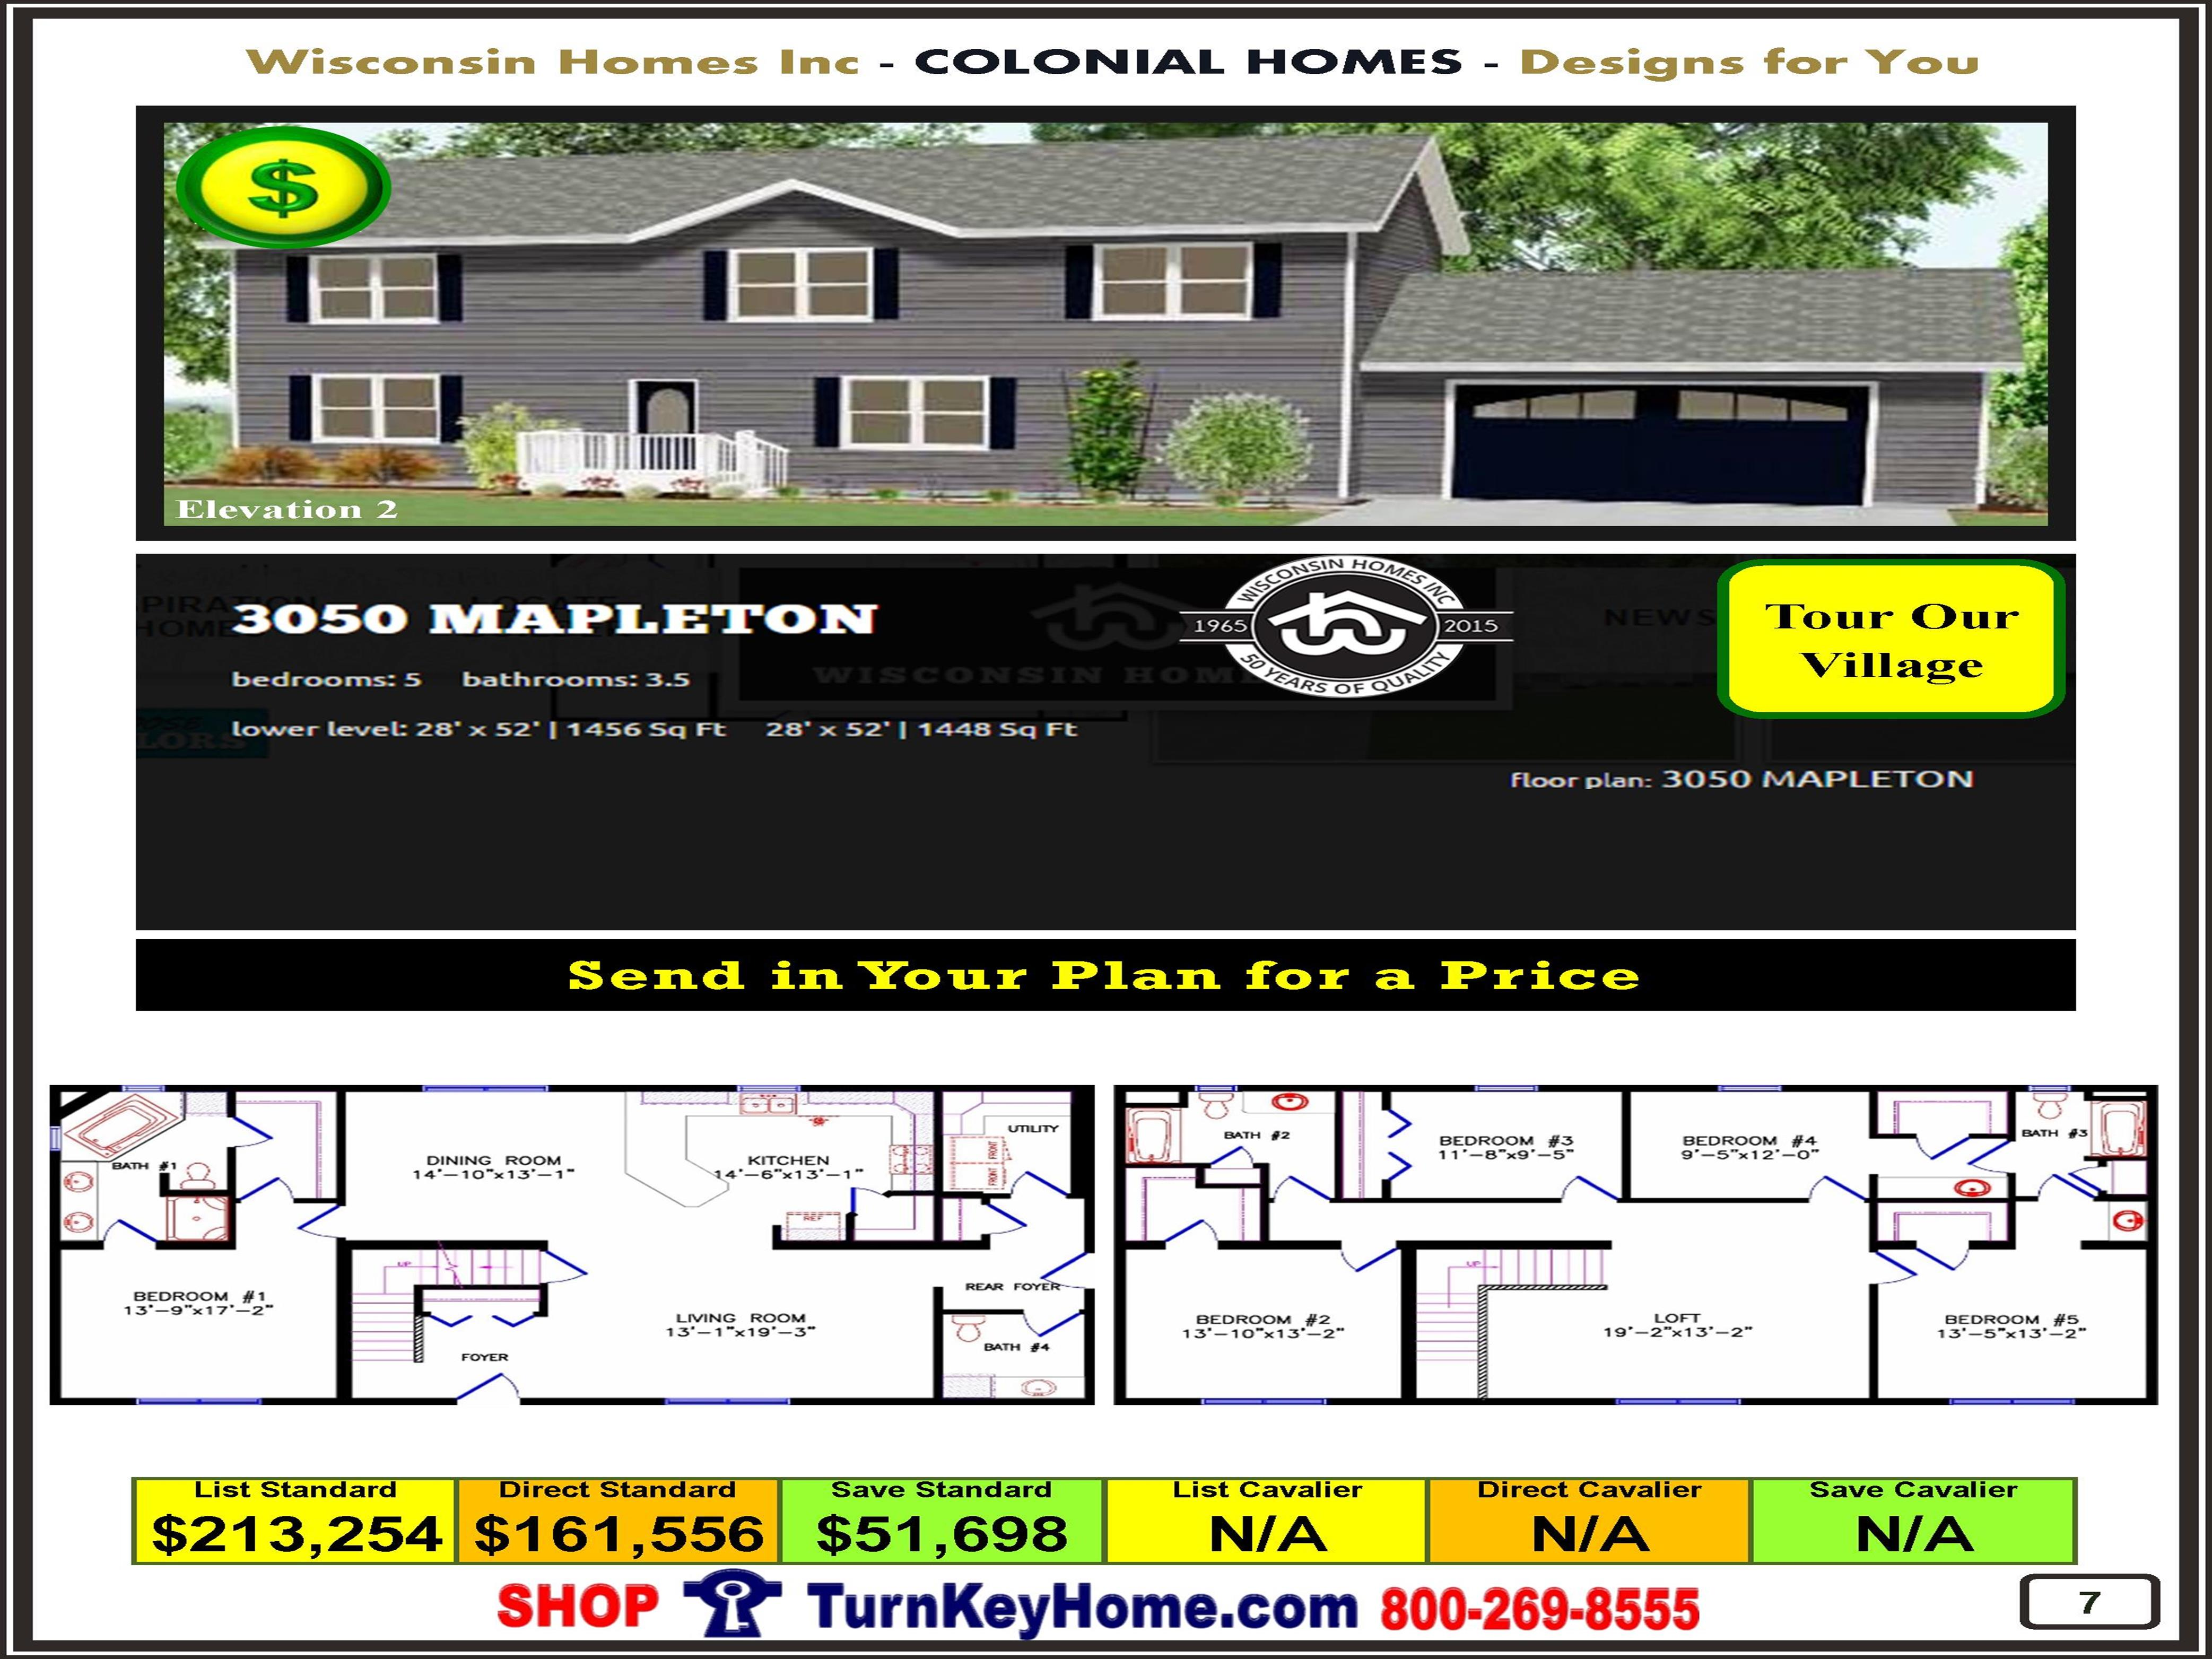 3050 MAPLETON E2 Wisconsin Homes inc. Modular Colonial Home Plan Price